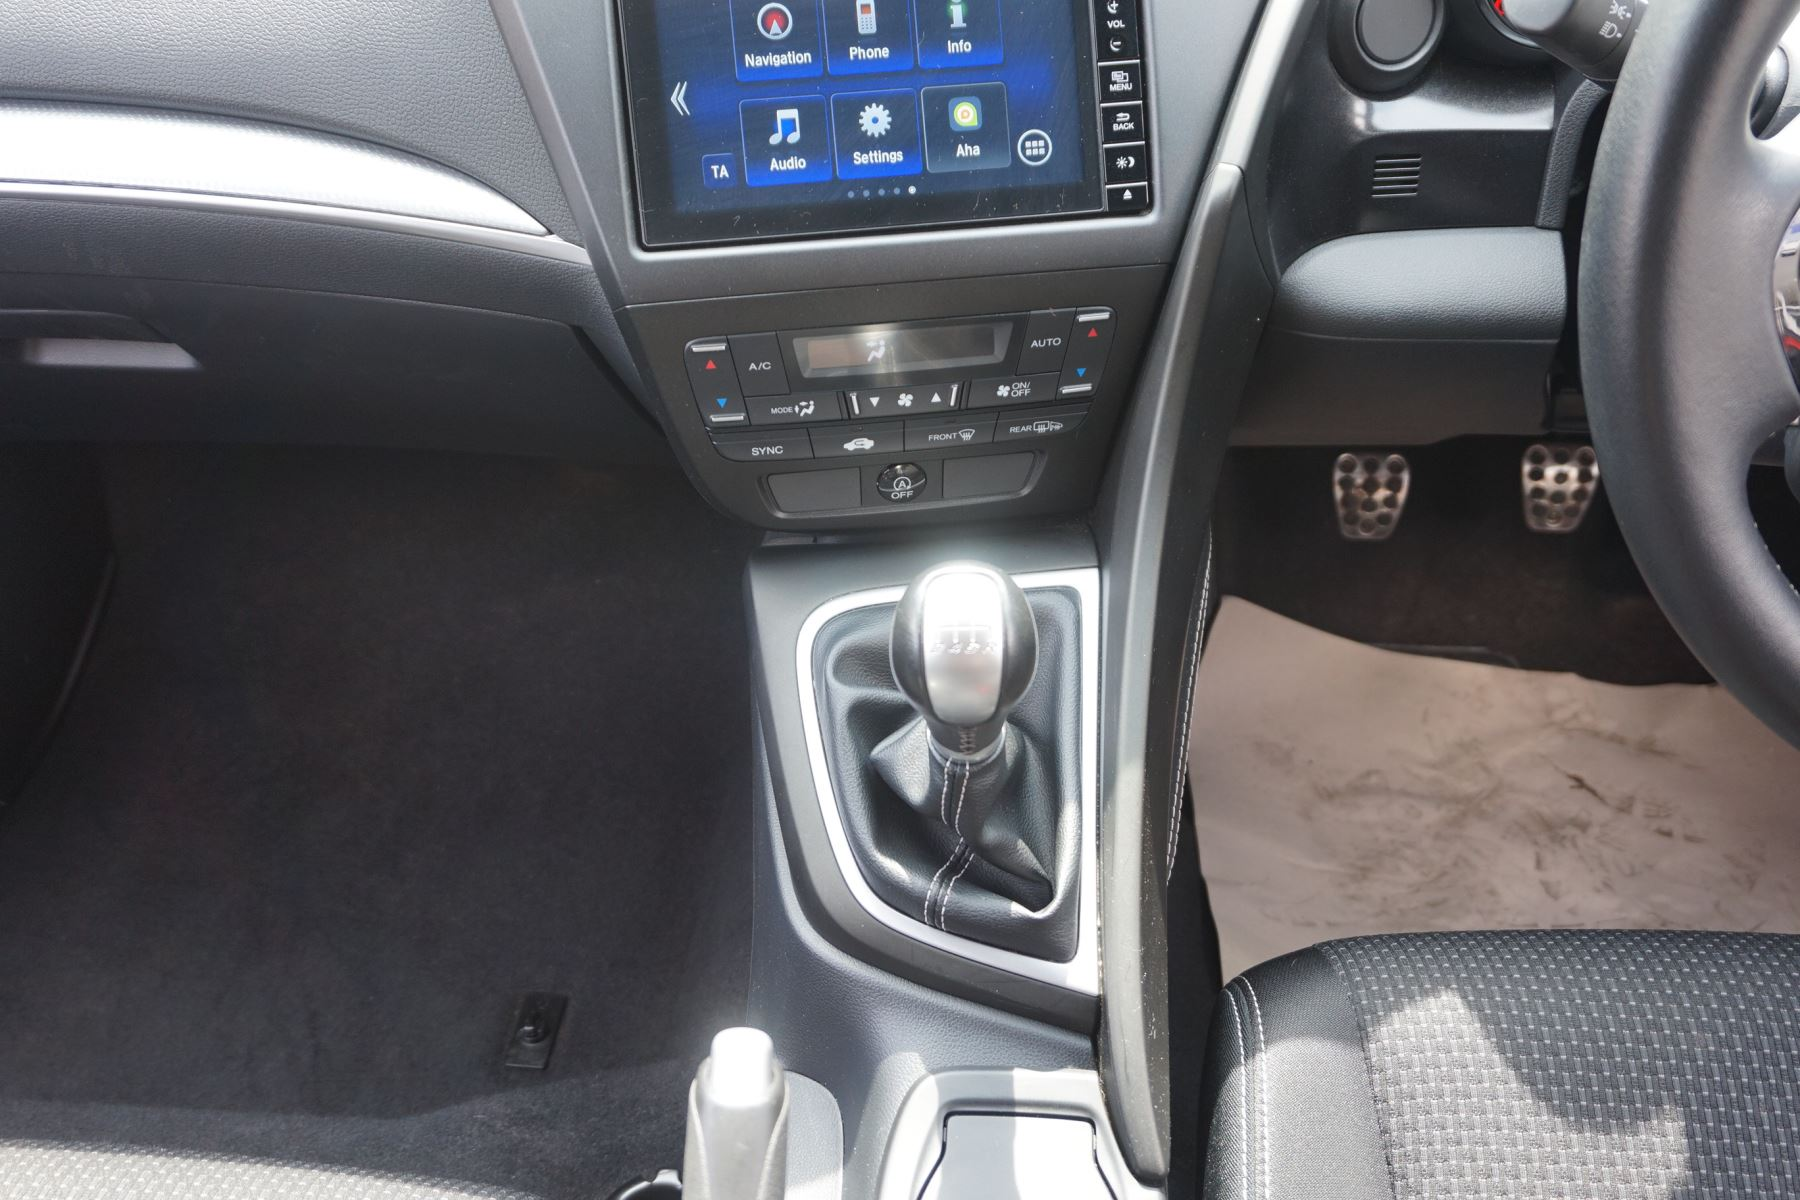 Honda Civic 1.6 i-DTEC Sport [Nav] image 12